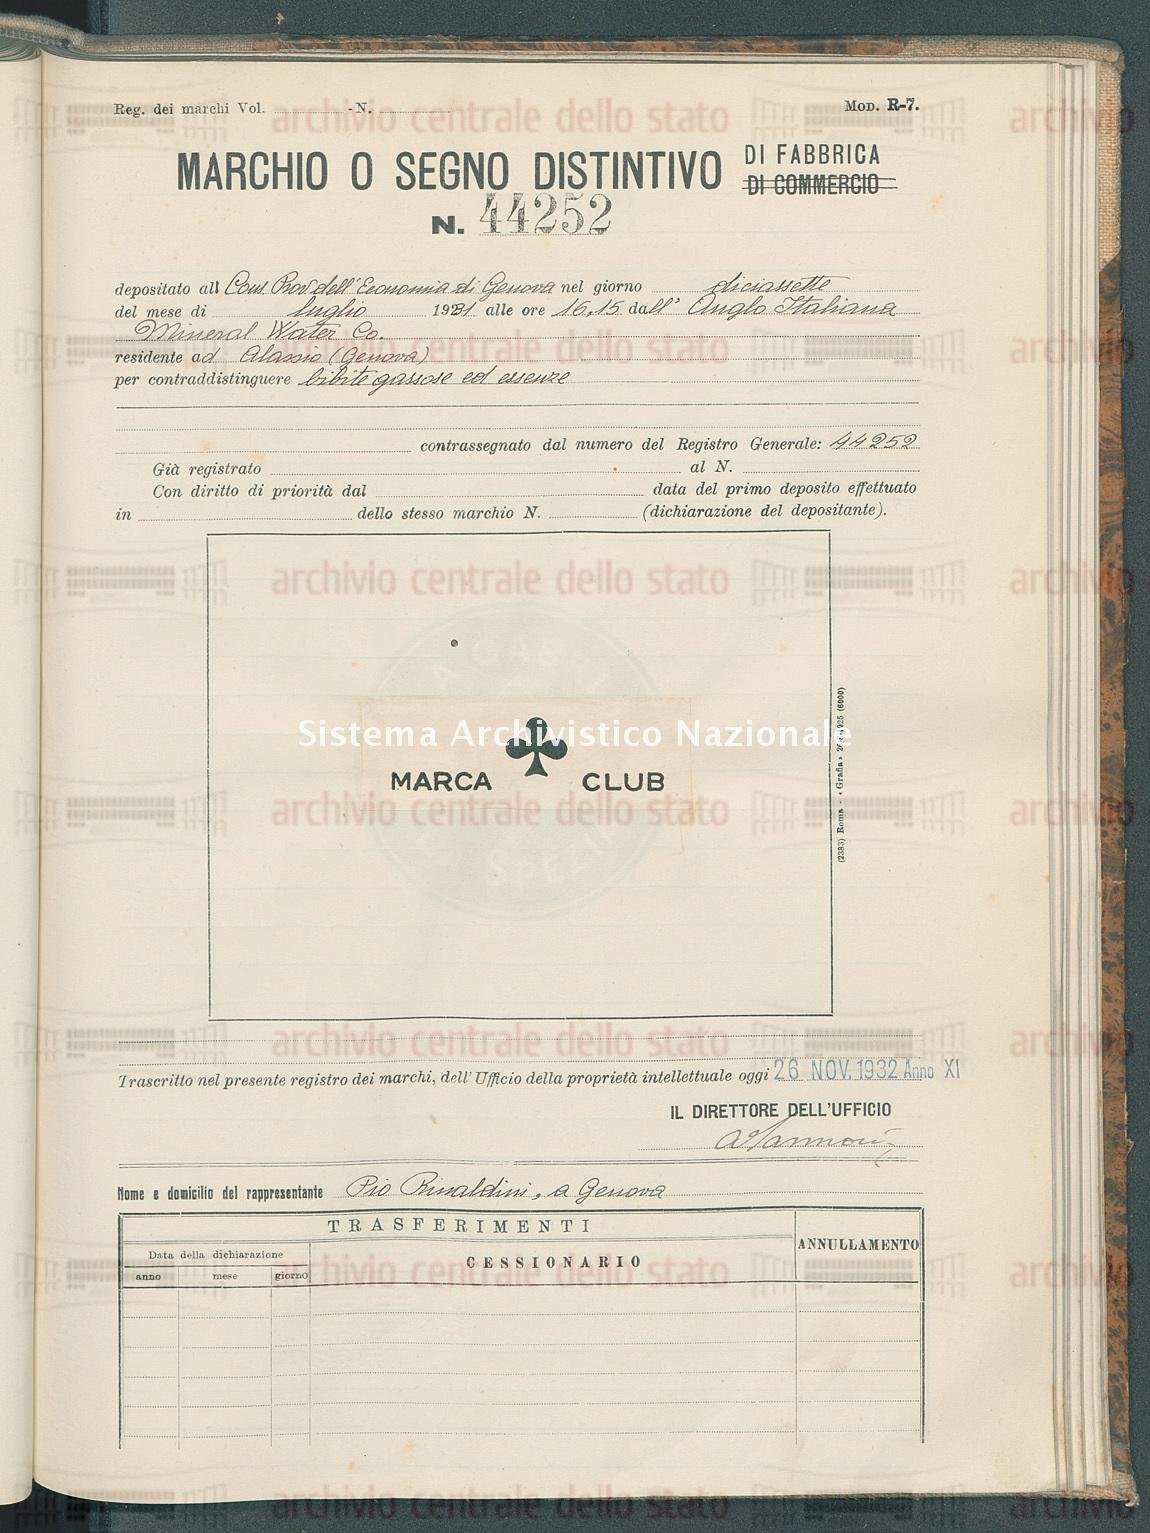 Bibite gassose ed essenze Anglo Italiana Mineral Water Co. (26/11/1932)